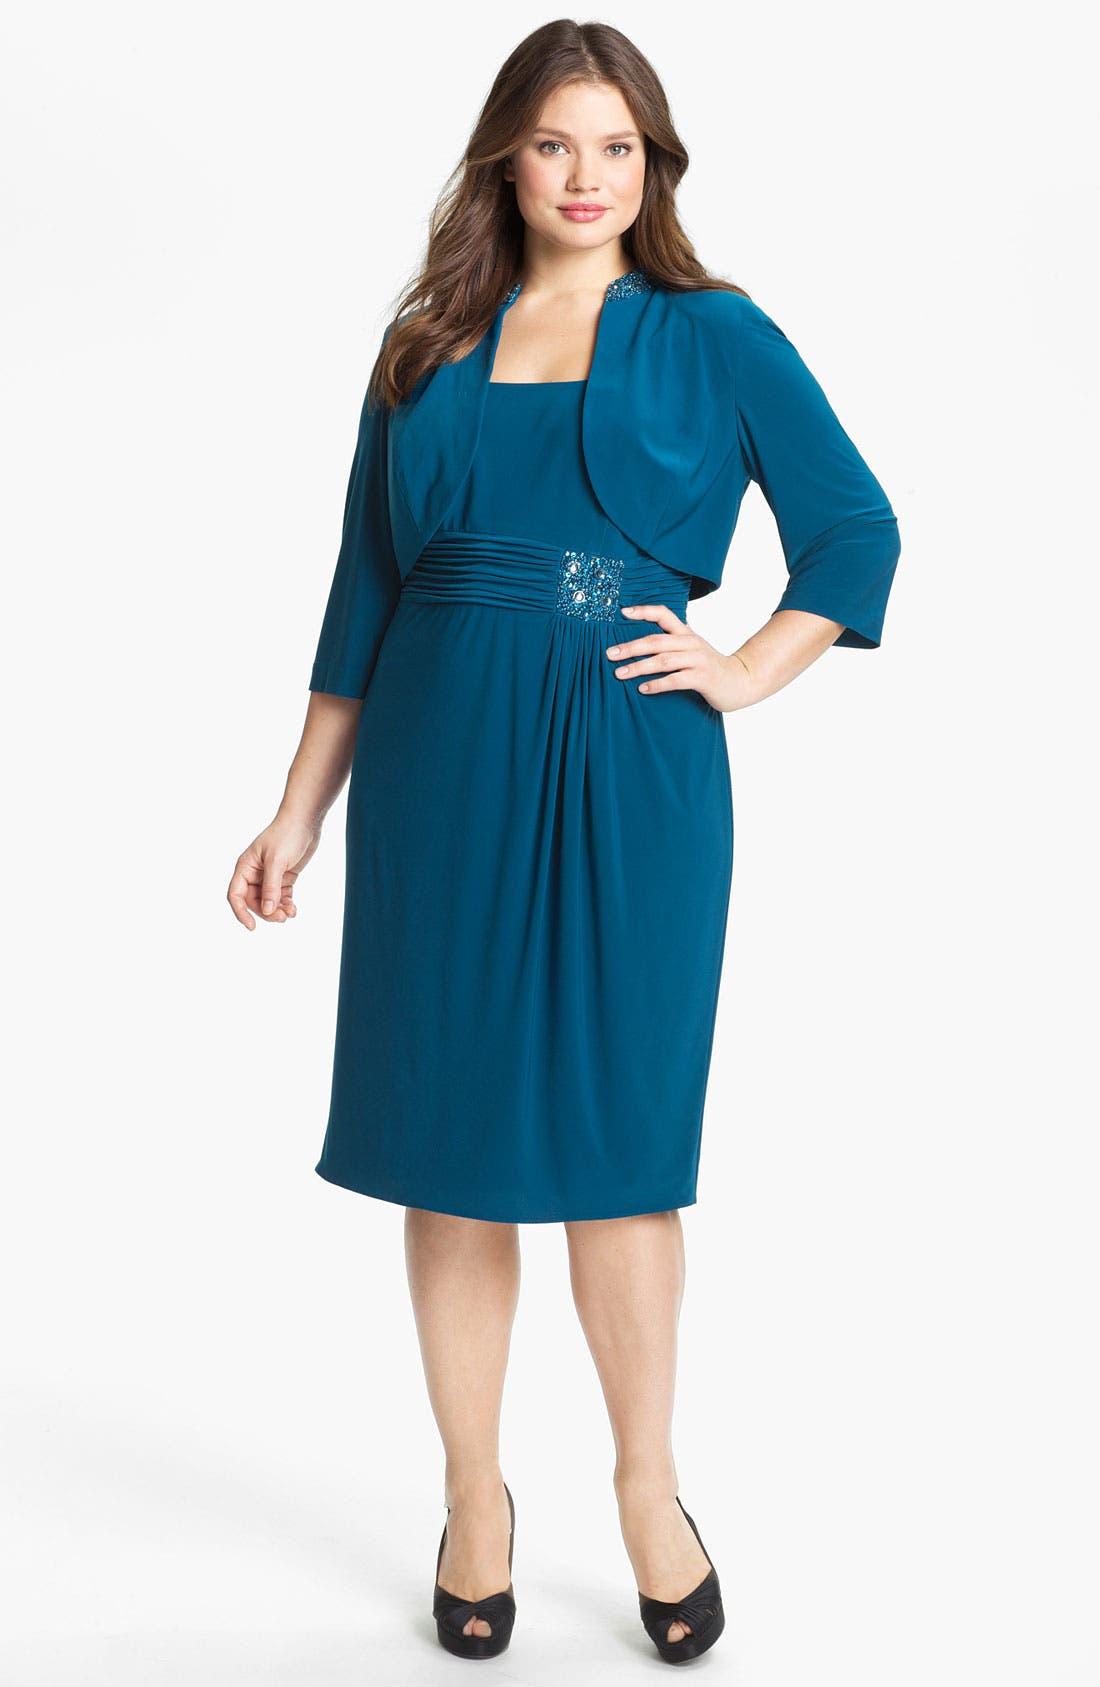 Alternate Image 1 Selected - Alex Evenings Embellished Jersey Dress & Bolero (Plus Size)